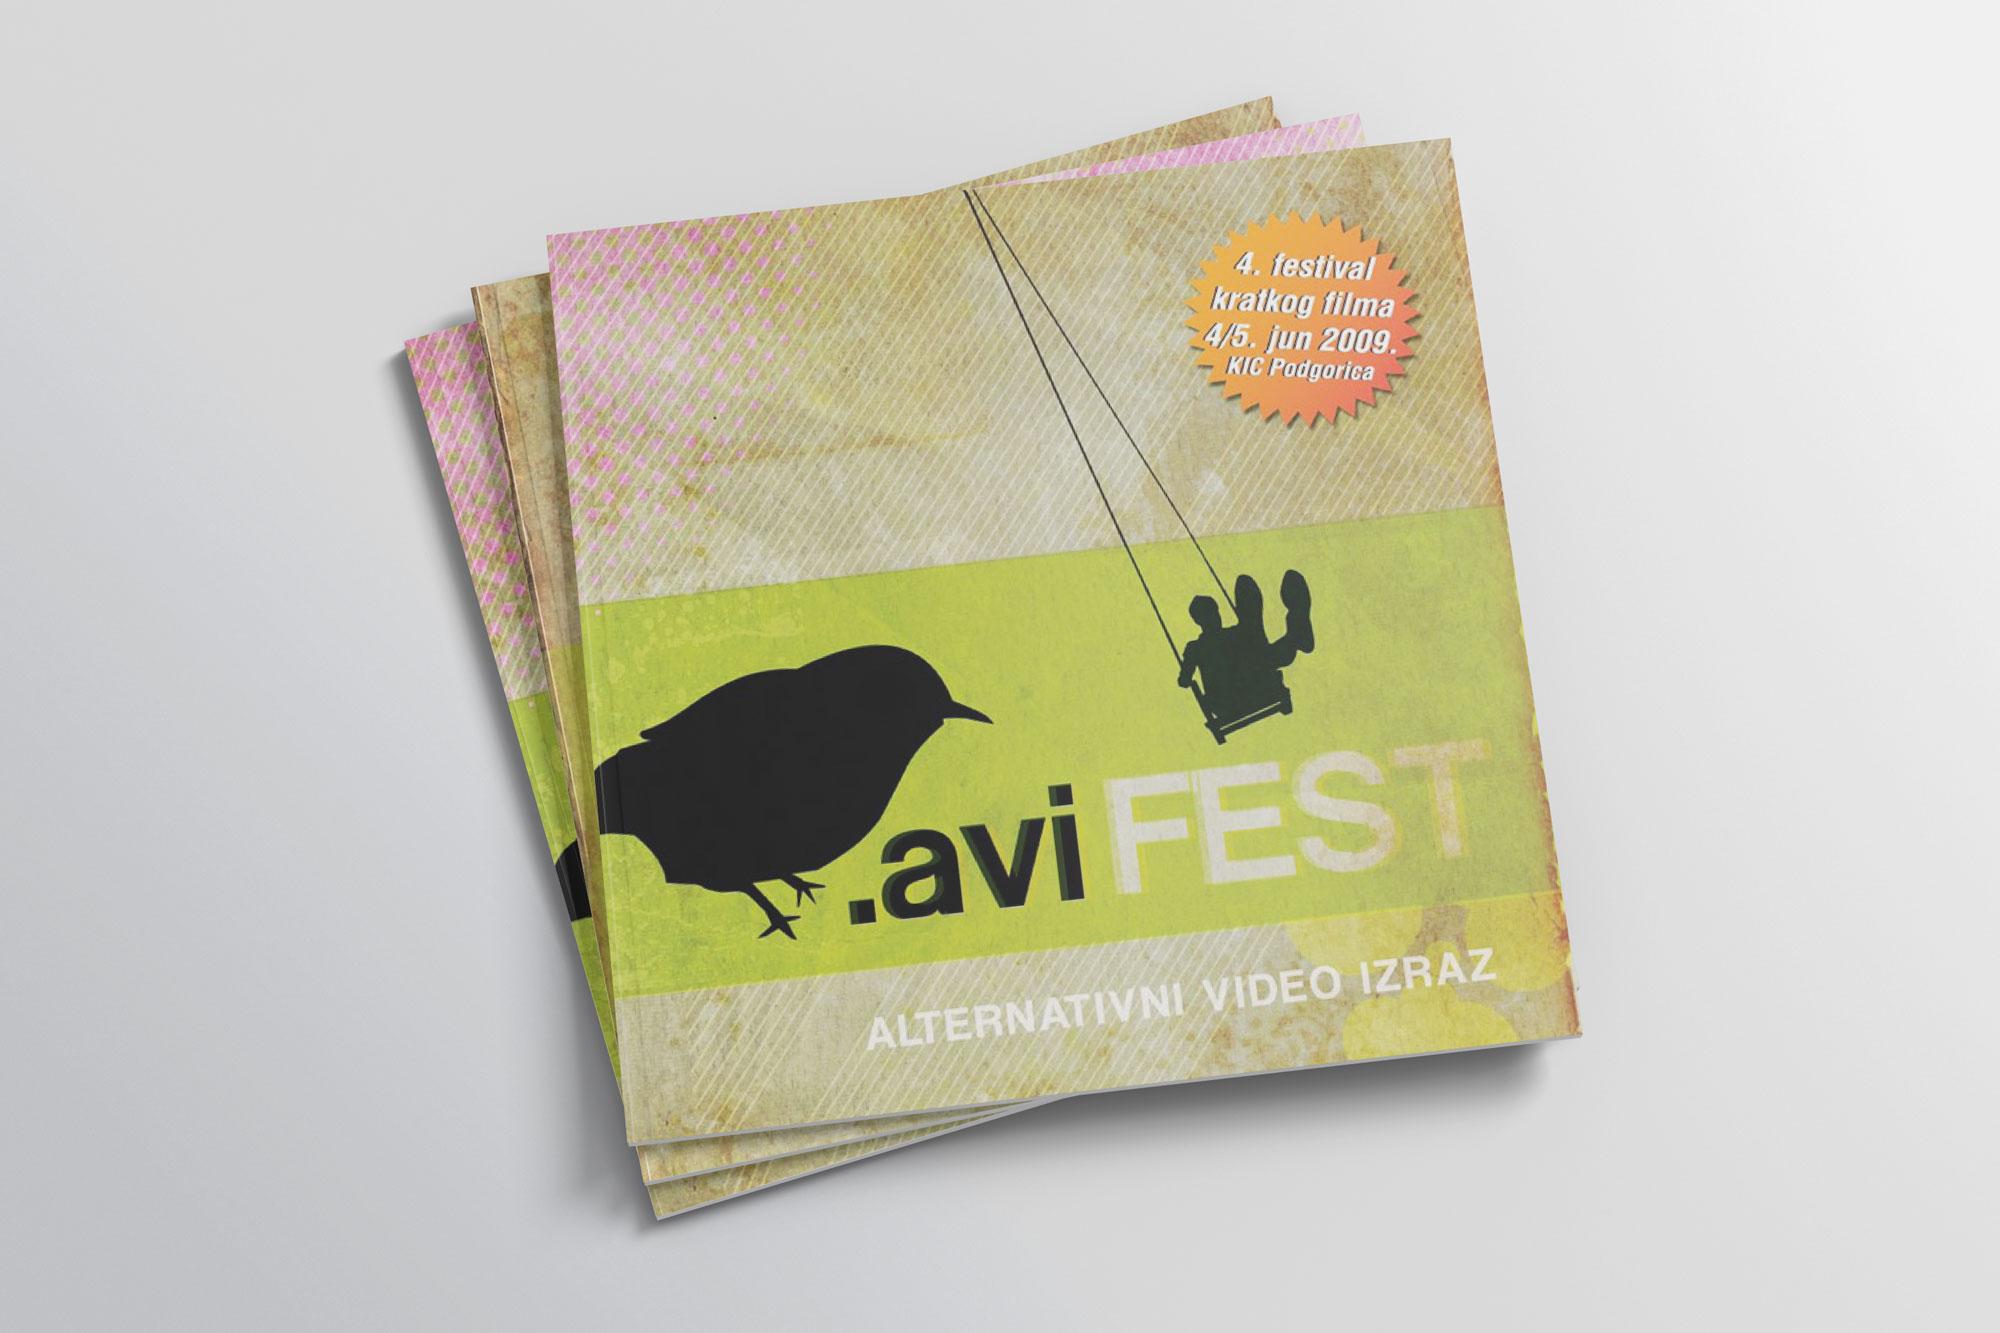 avi fest identity by Jovo vukcevic / jovonanovo.me